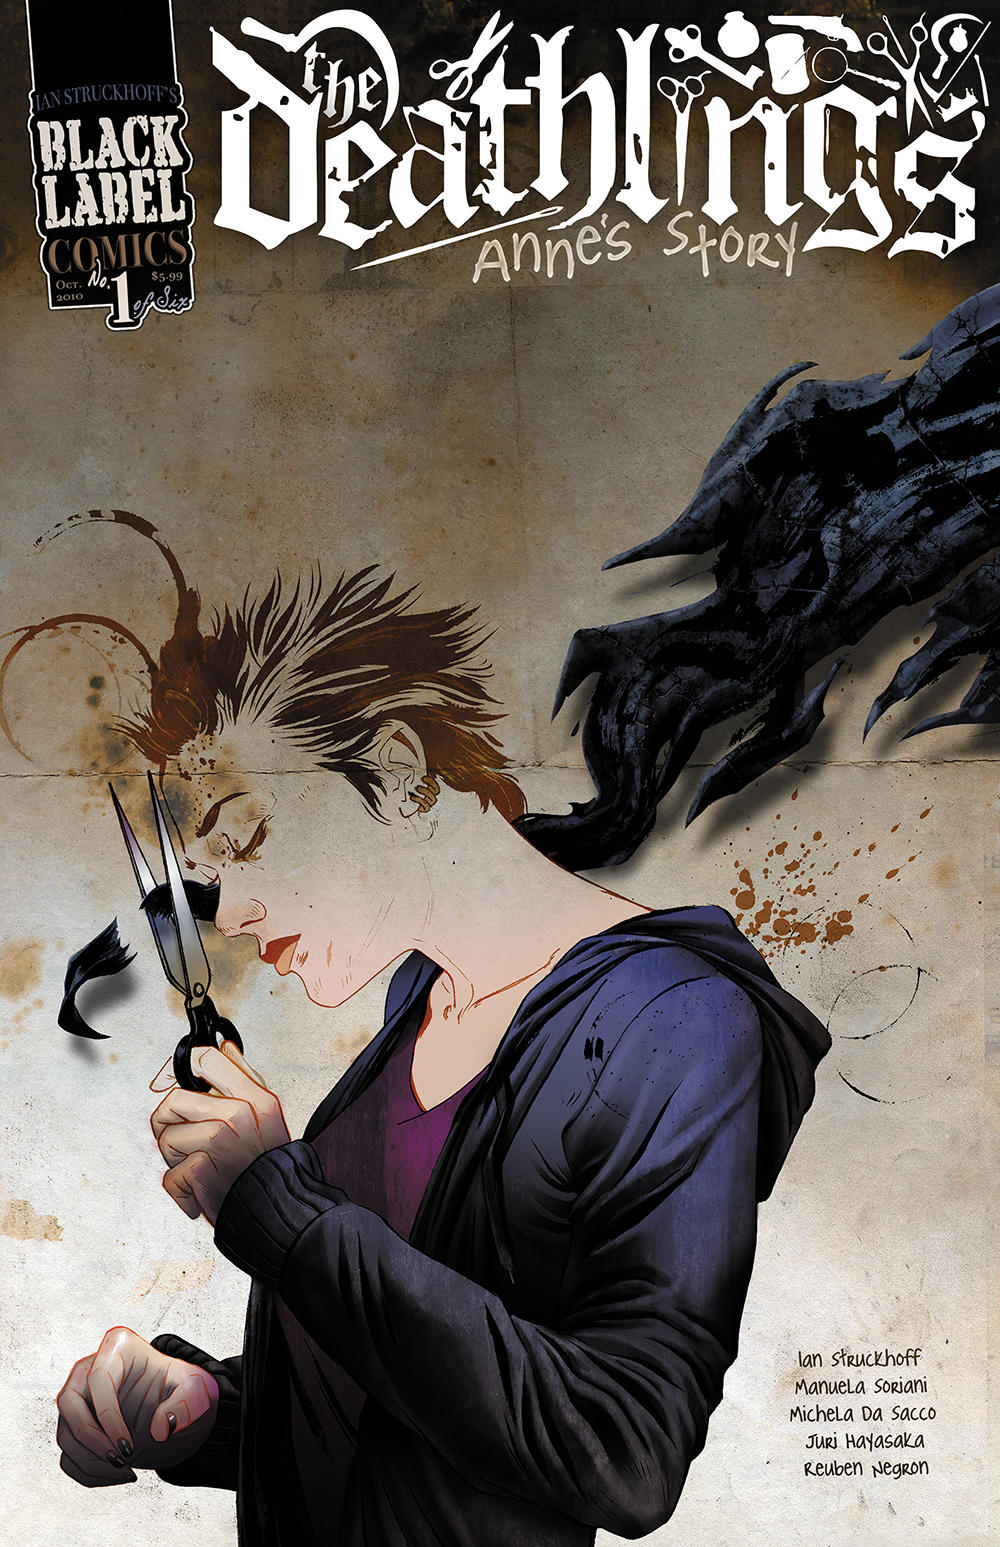 The Deathlings: Anne's Story #1, design by Ian Struckhoff, artwork by Reuben Negron